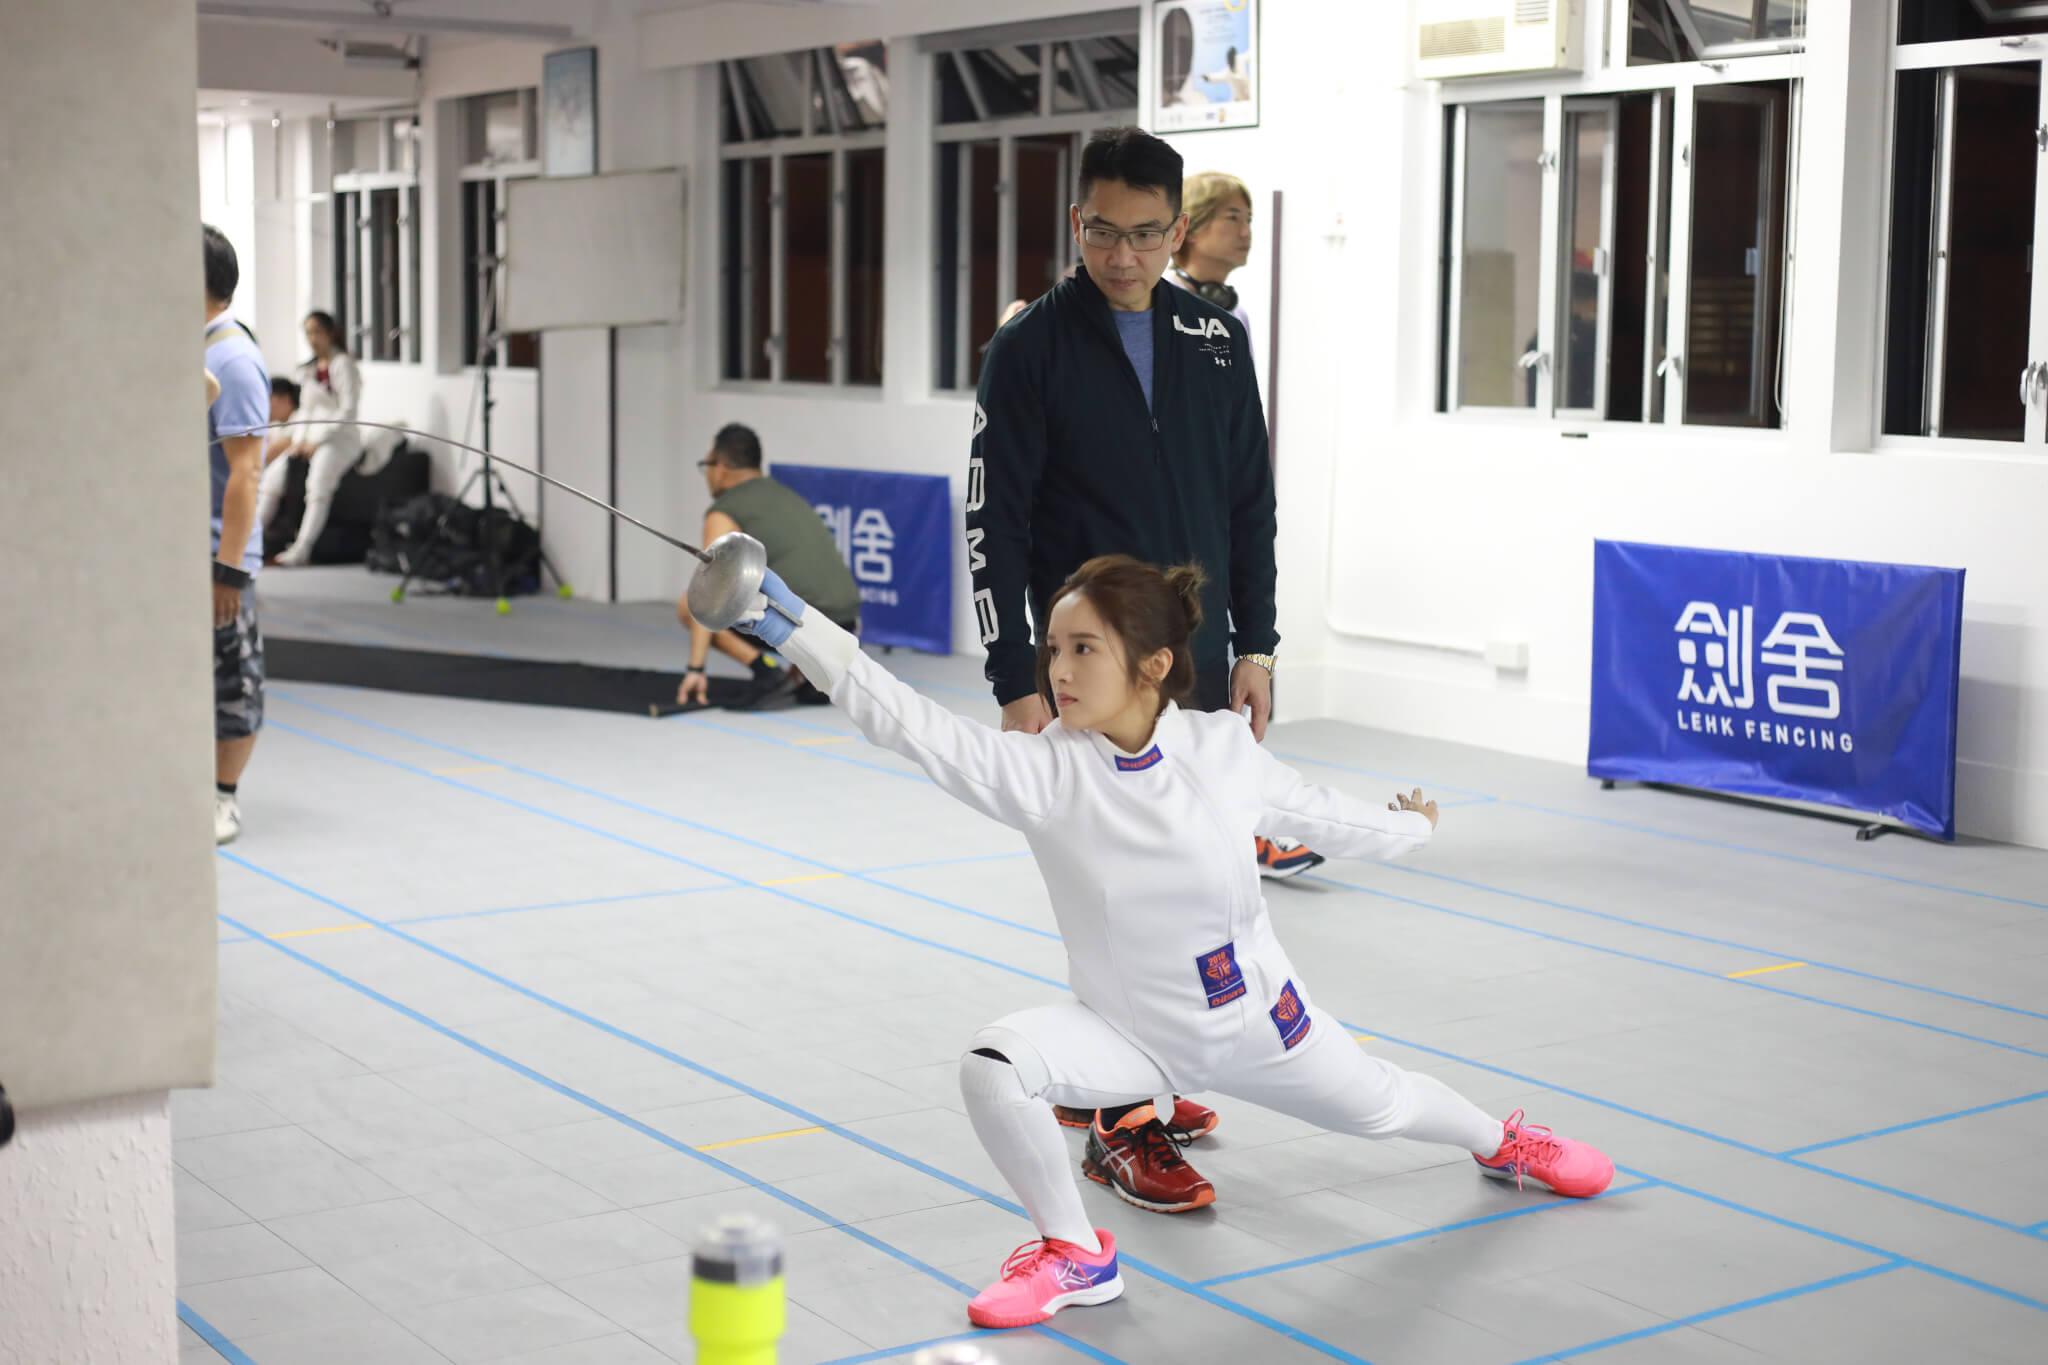 Judy表示教練Patrick教學嚴厲,令她不停迫自己進步。